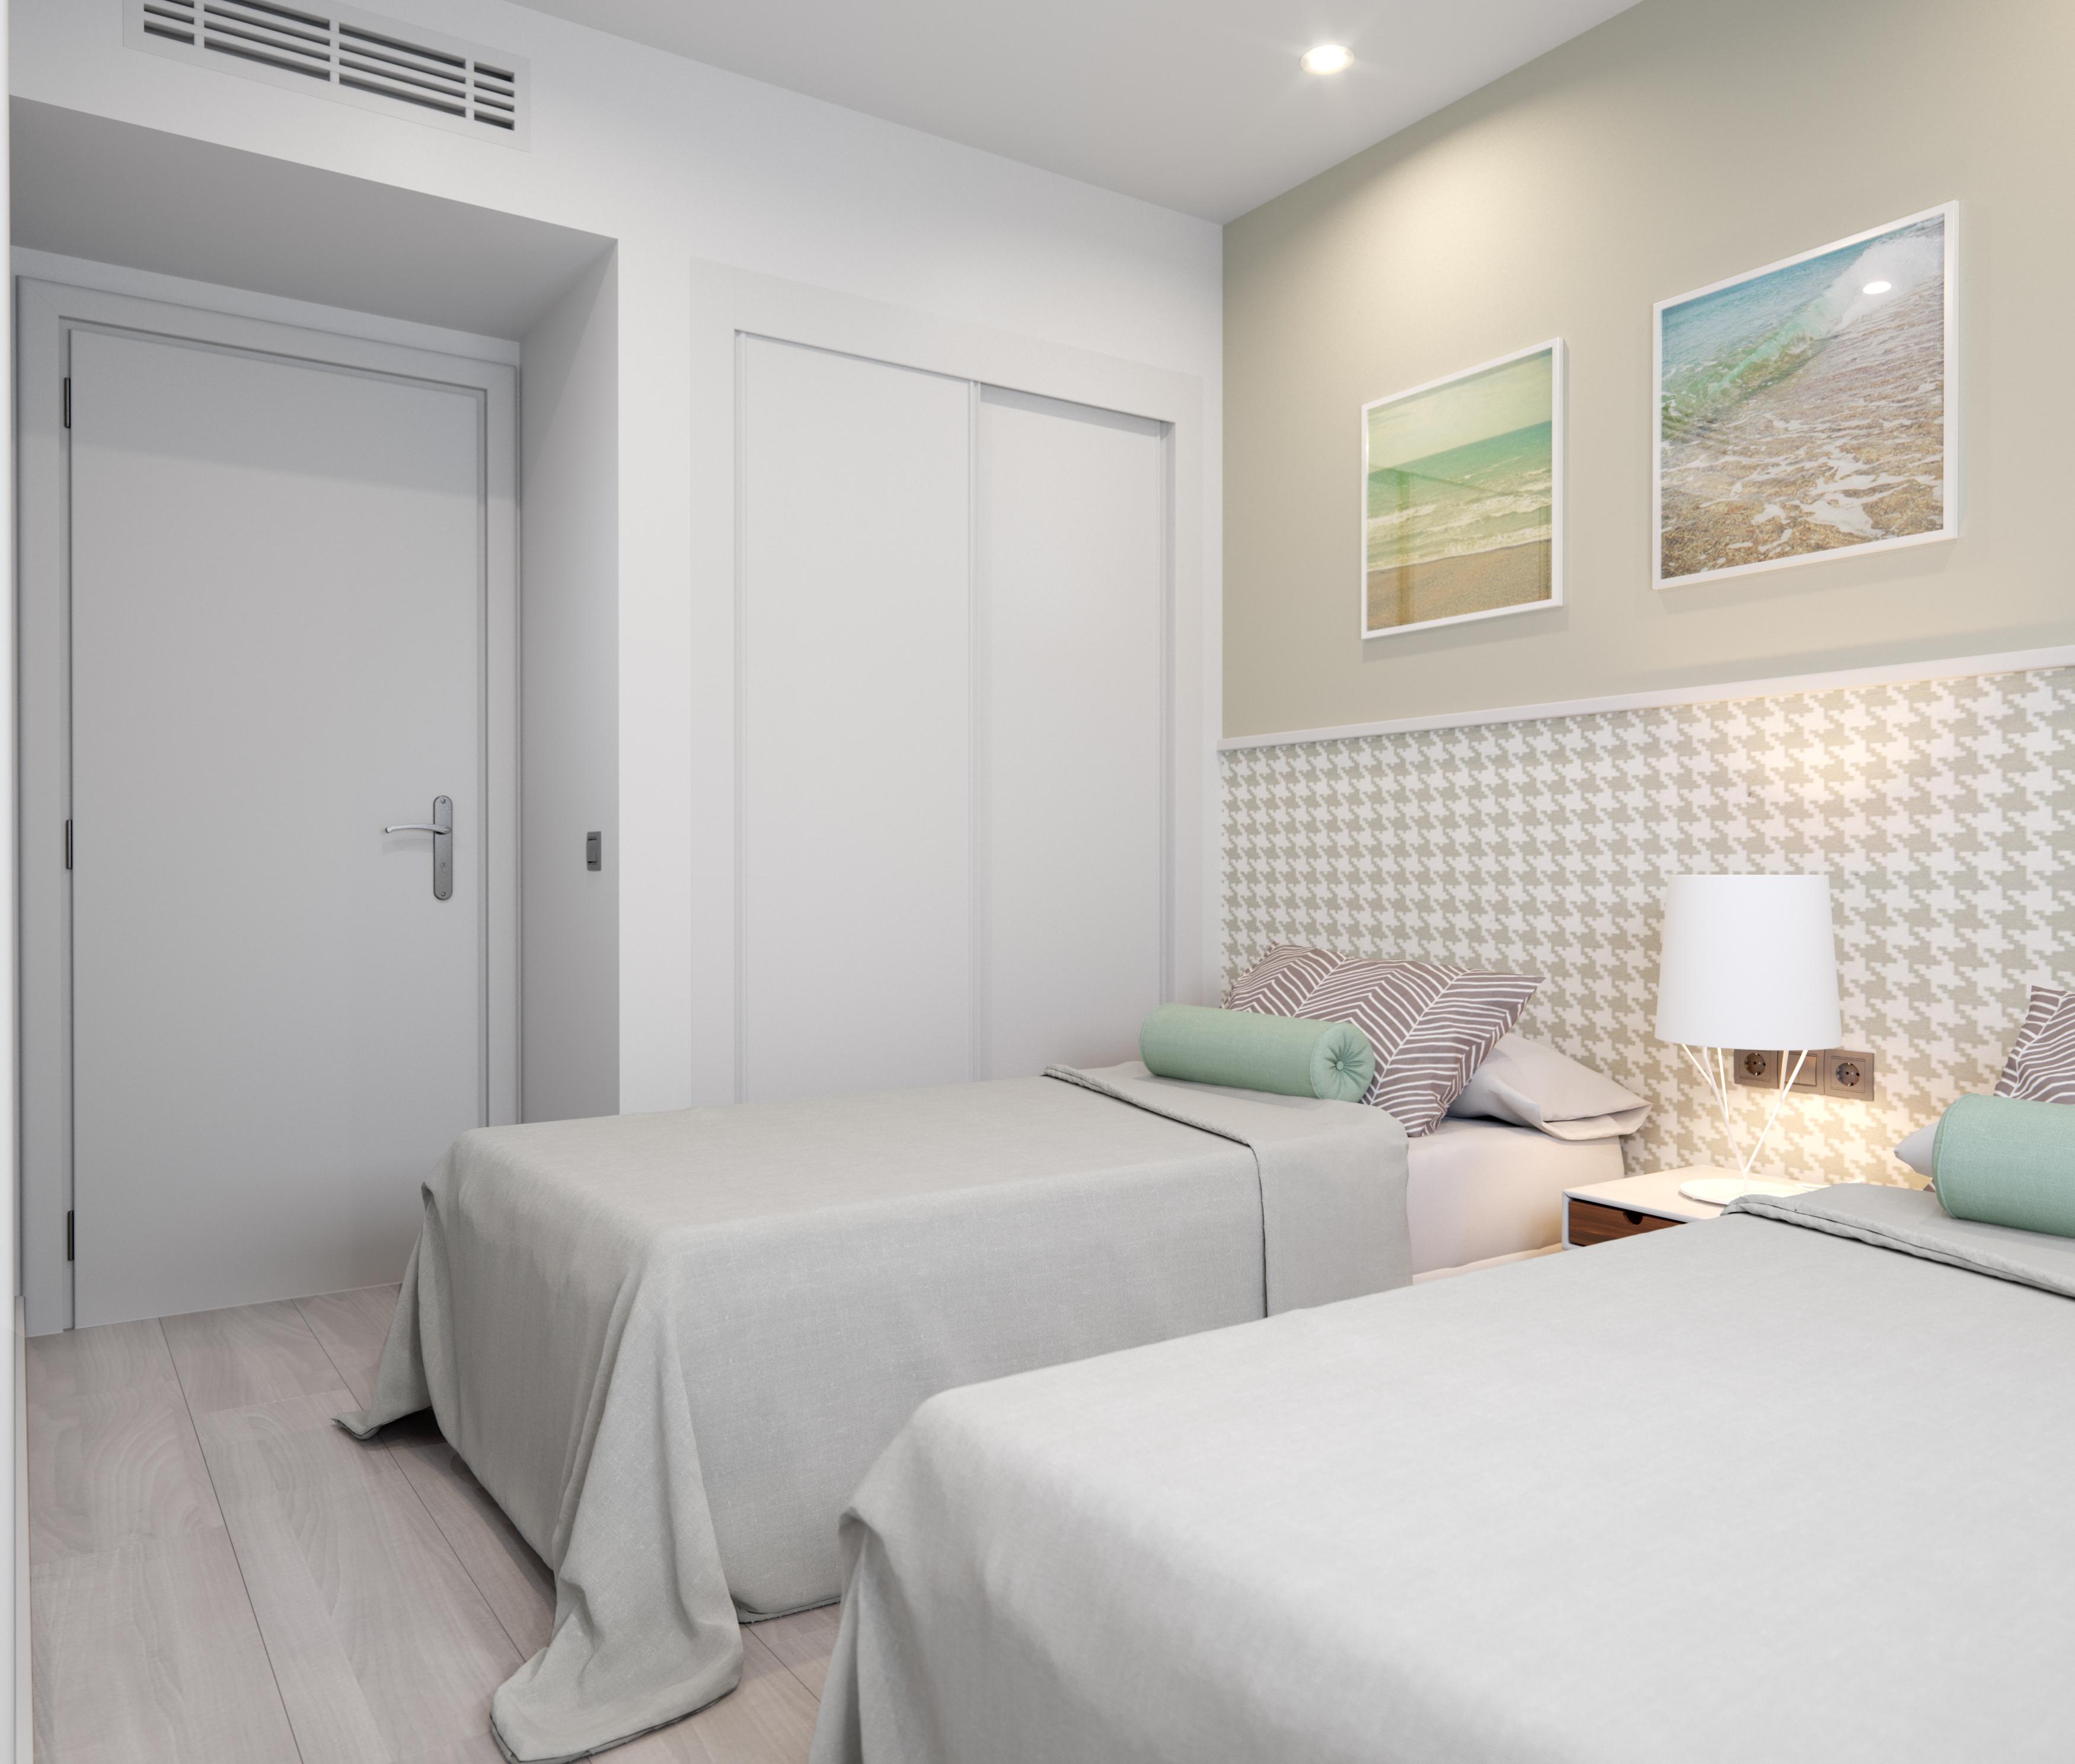 2 bedroom apartment For Sale in Roldan - photograph 8